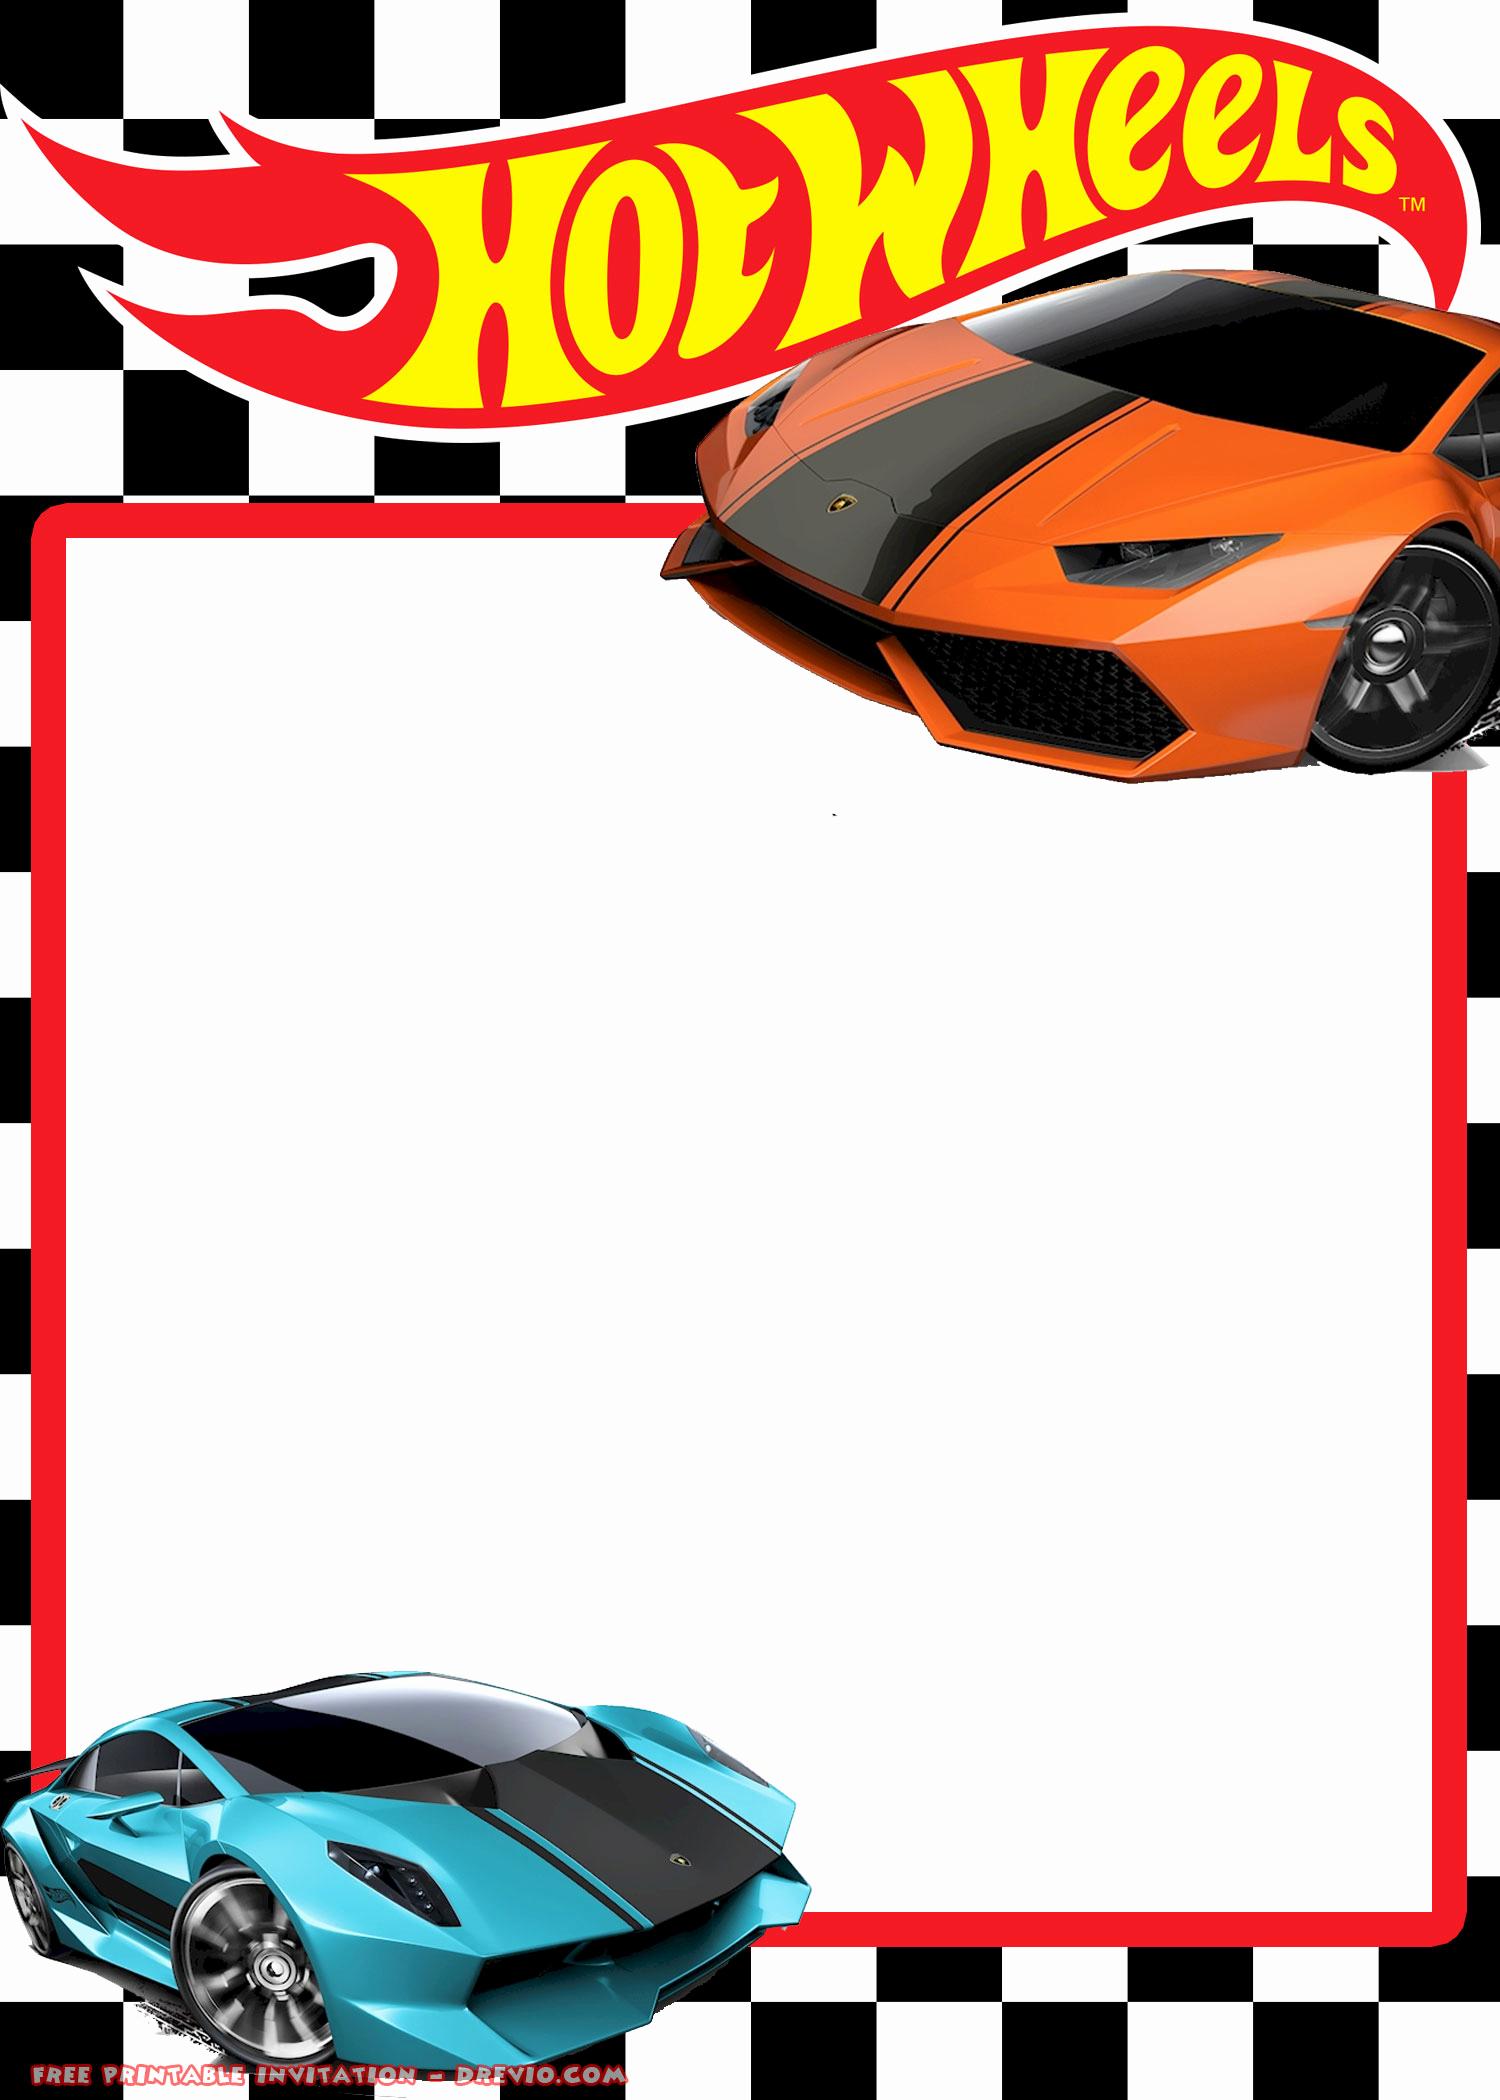 Hot Wheels Invitation Template Elegant Free Hot Wheels Lamborghini Invitation Templates